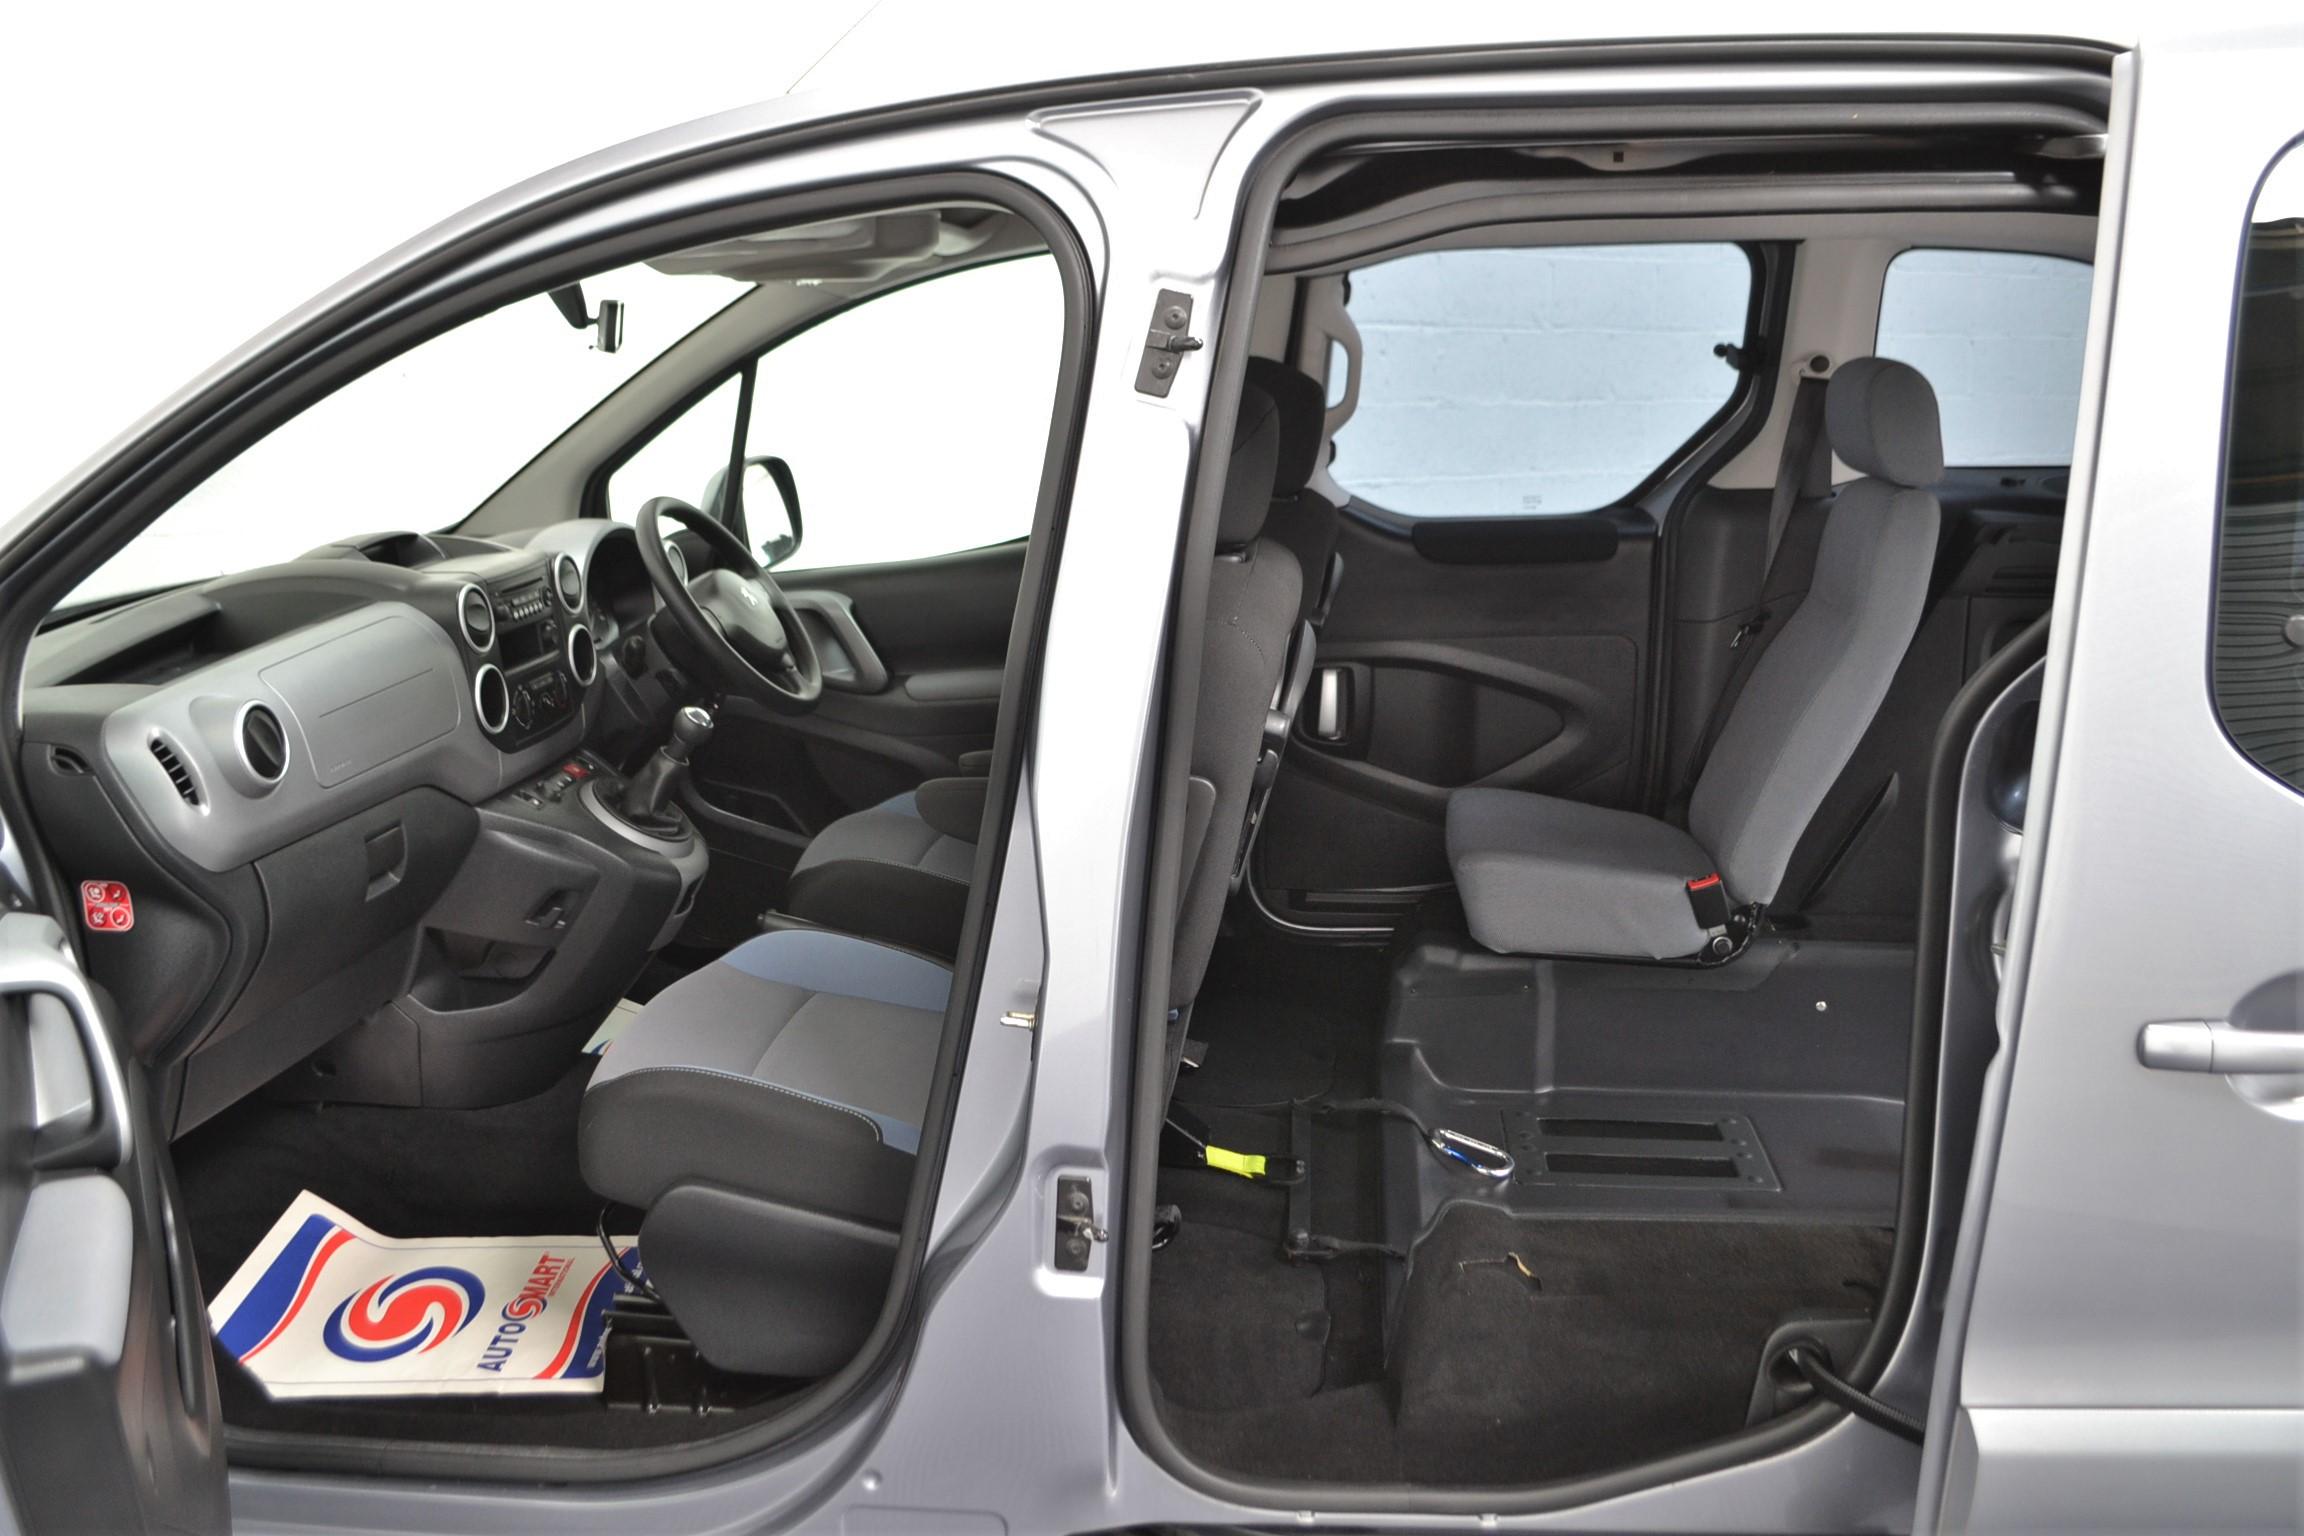 Used Wav Cars for Sale UK Citroen Berlingo WAV Car Peugeot Partner Petrol Wheelchair Accessible Vehicles Buy Sell Bristol Somerset Devon Dorset 8